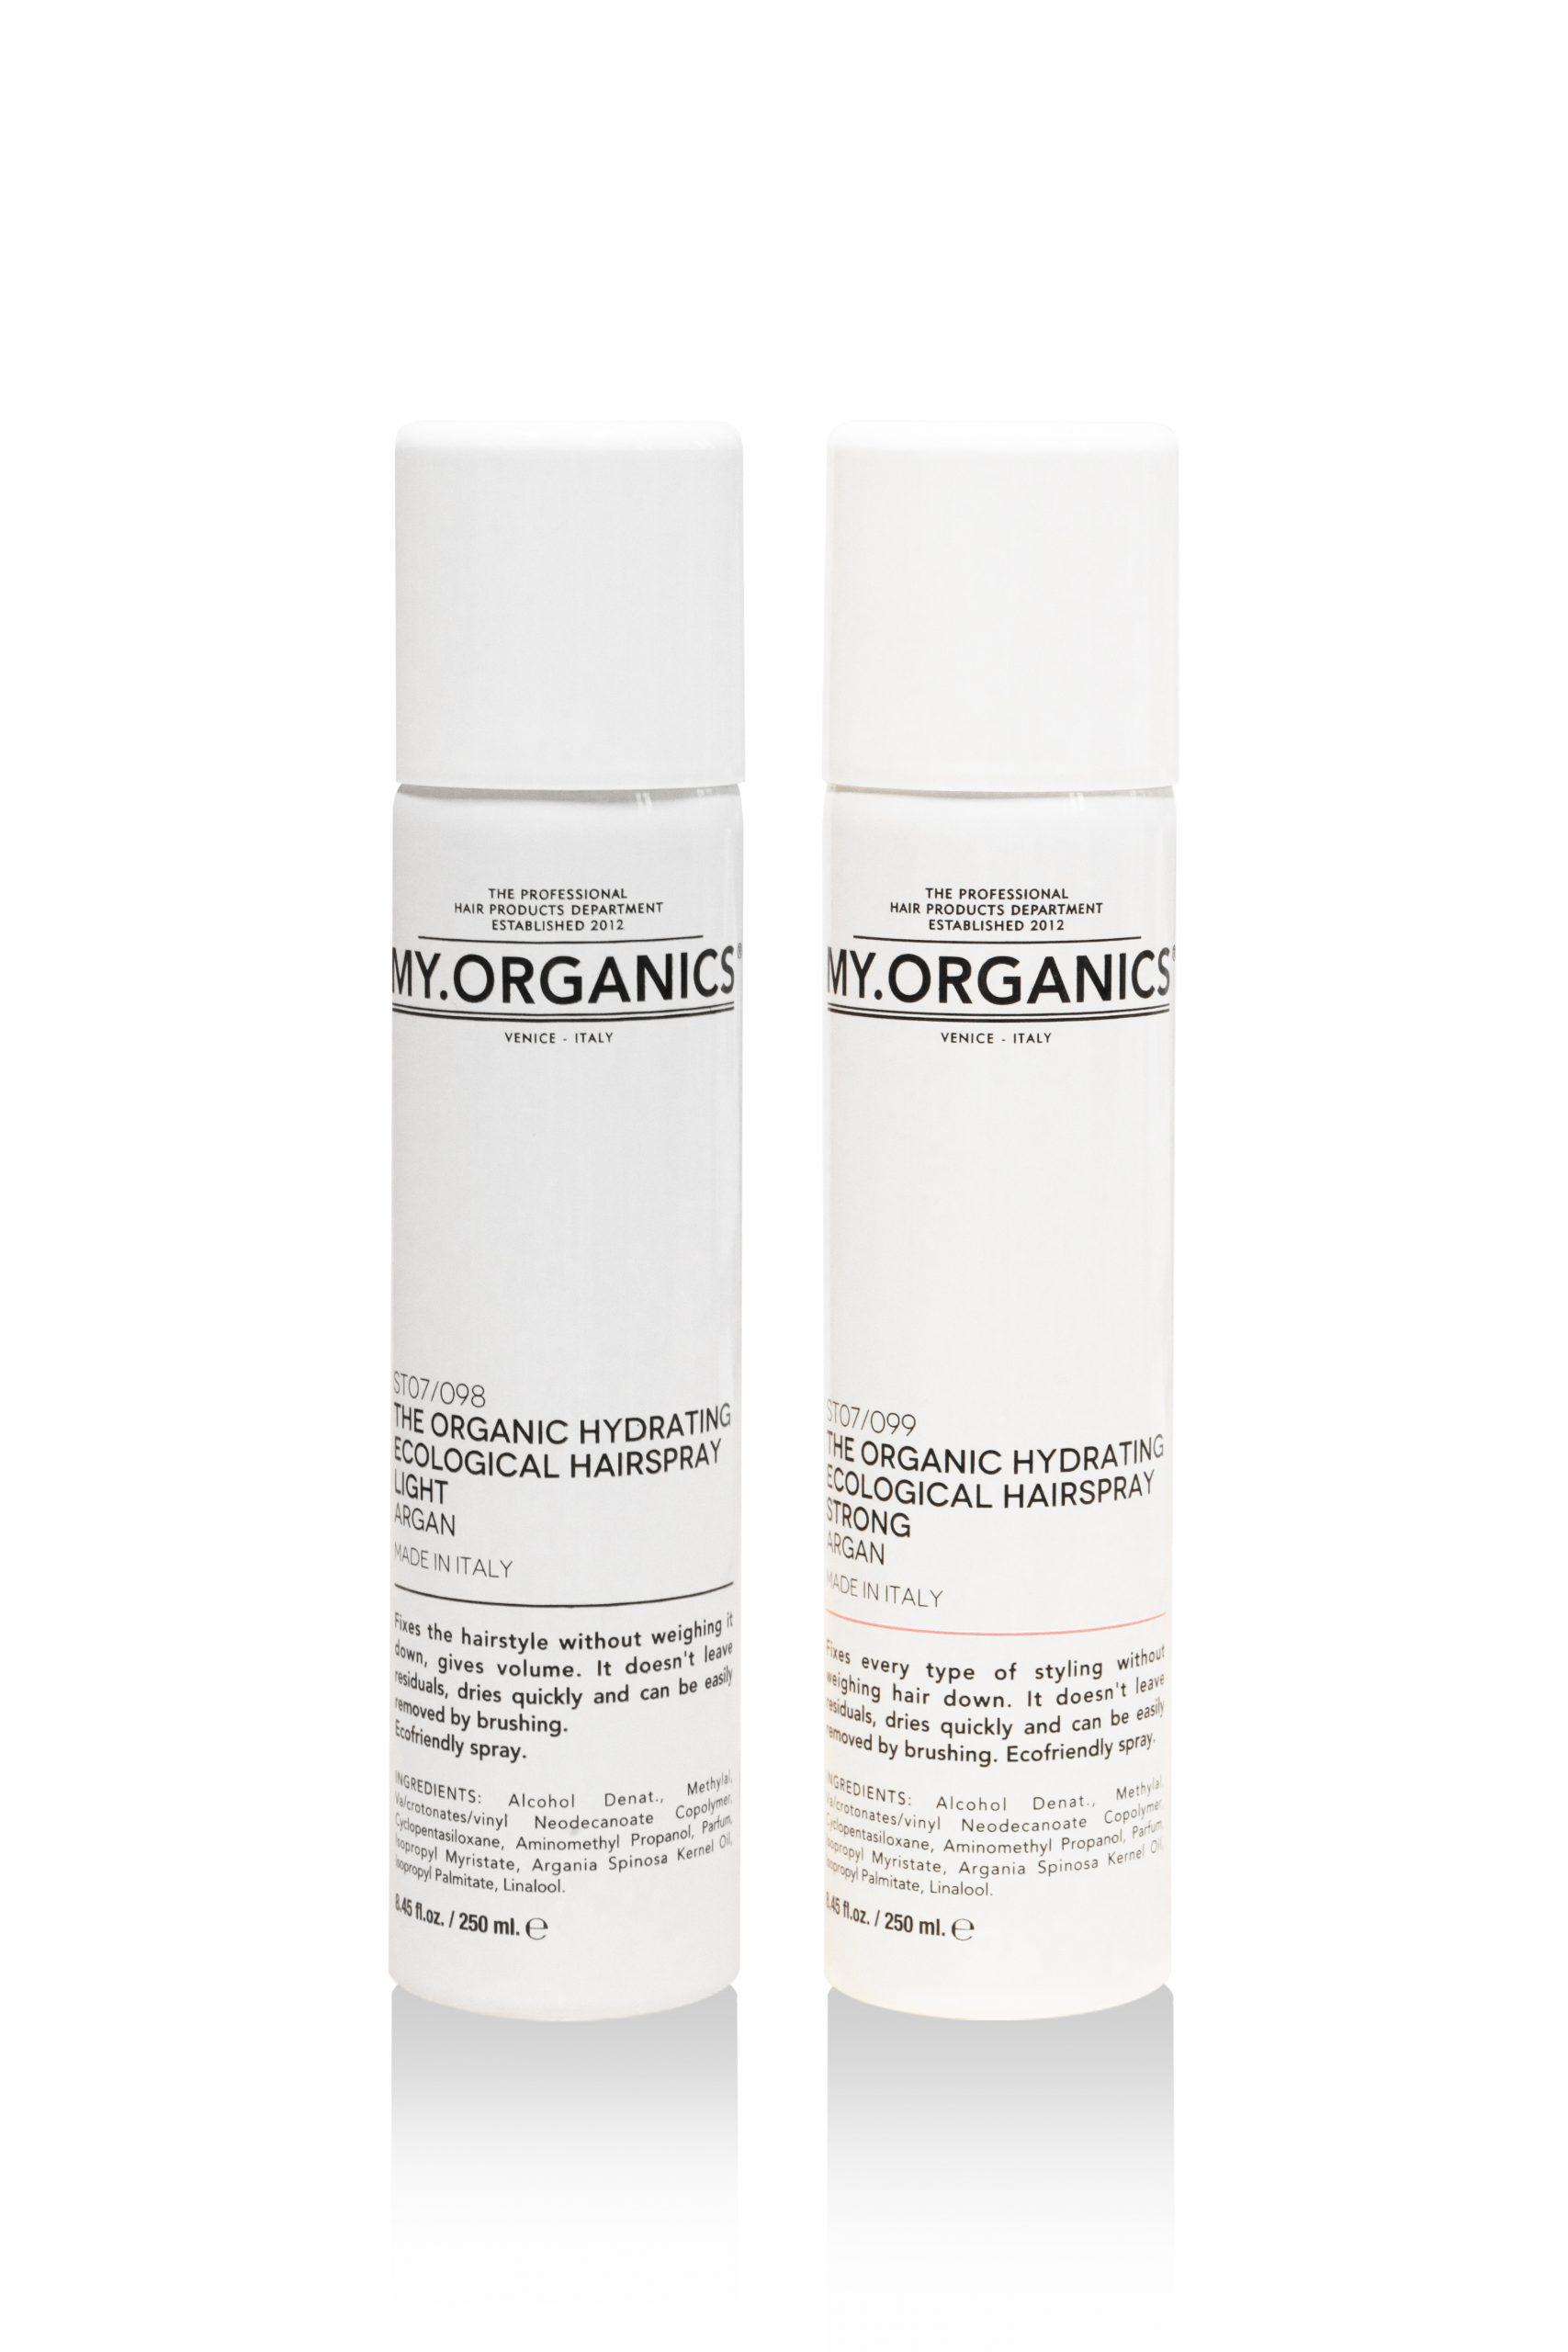 Hydrating Ecological hairspray MY.ORGANICS